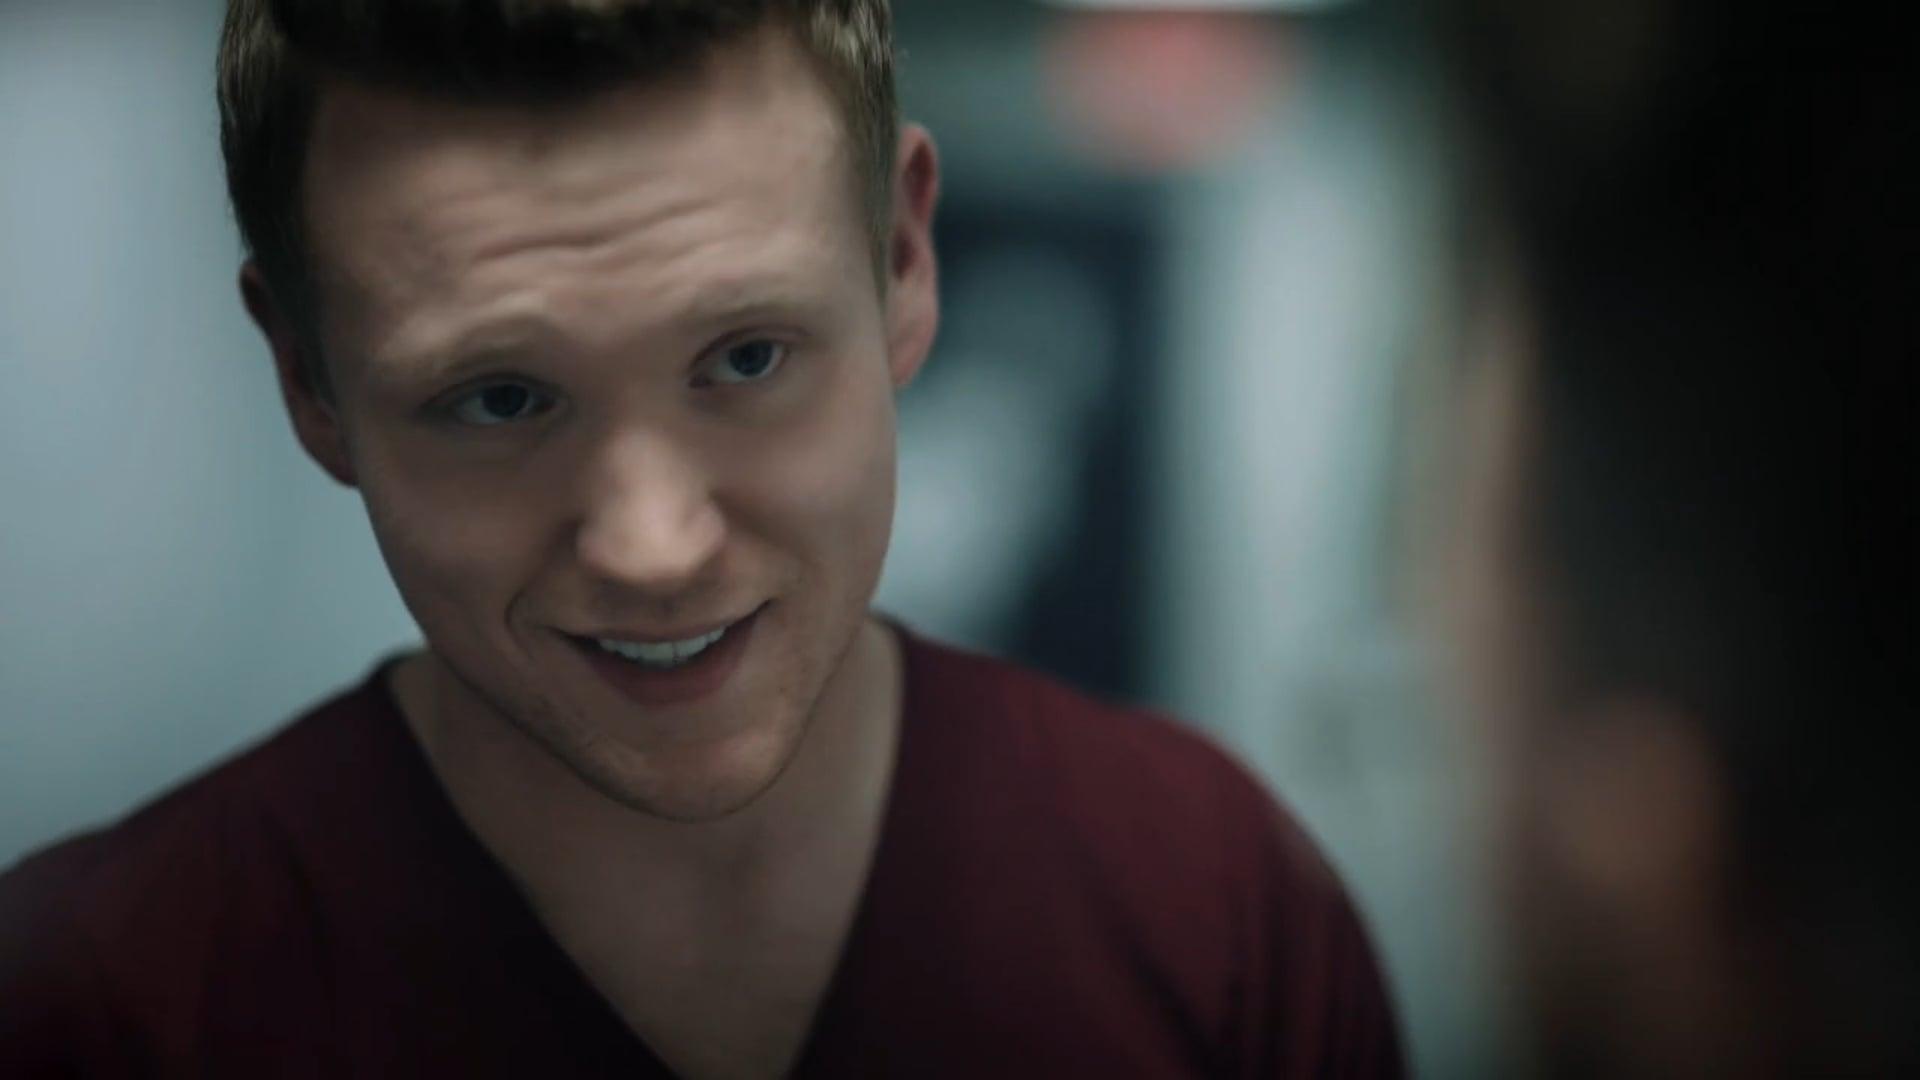 CLIP (DRAMA) - medical [Matt Williams]